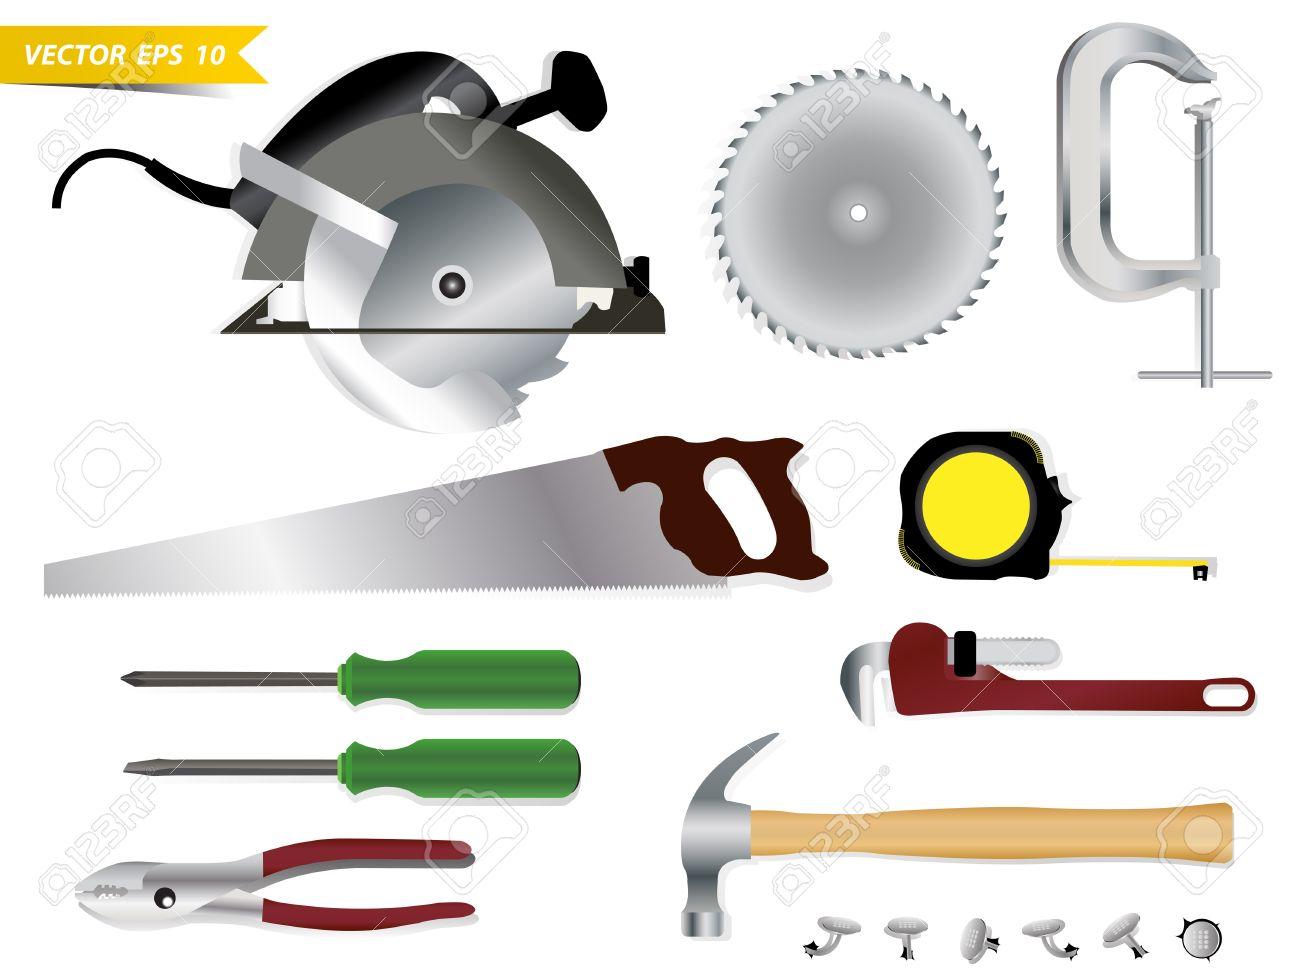 Carpentry Tools Vector Template Design